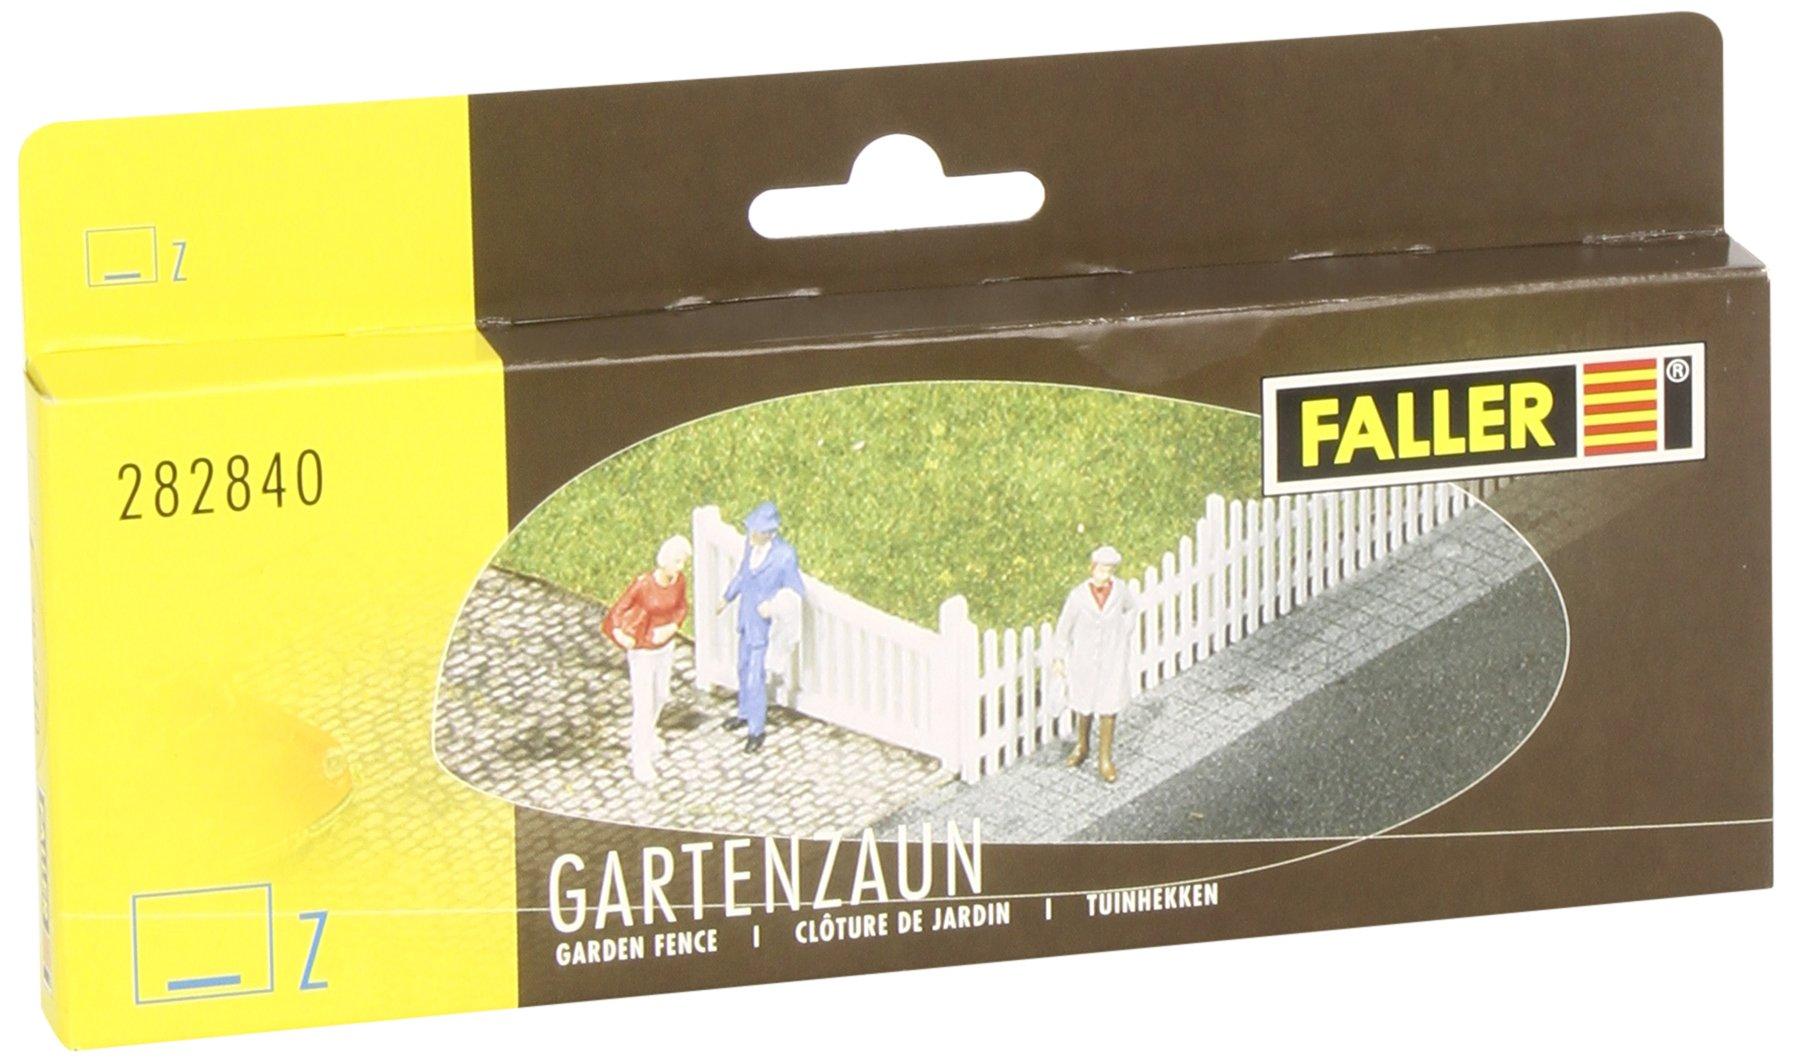 Faller 282840 Garden Fence 43.7cm Z Scale Building Kit